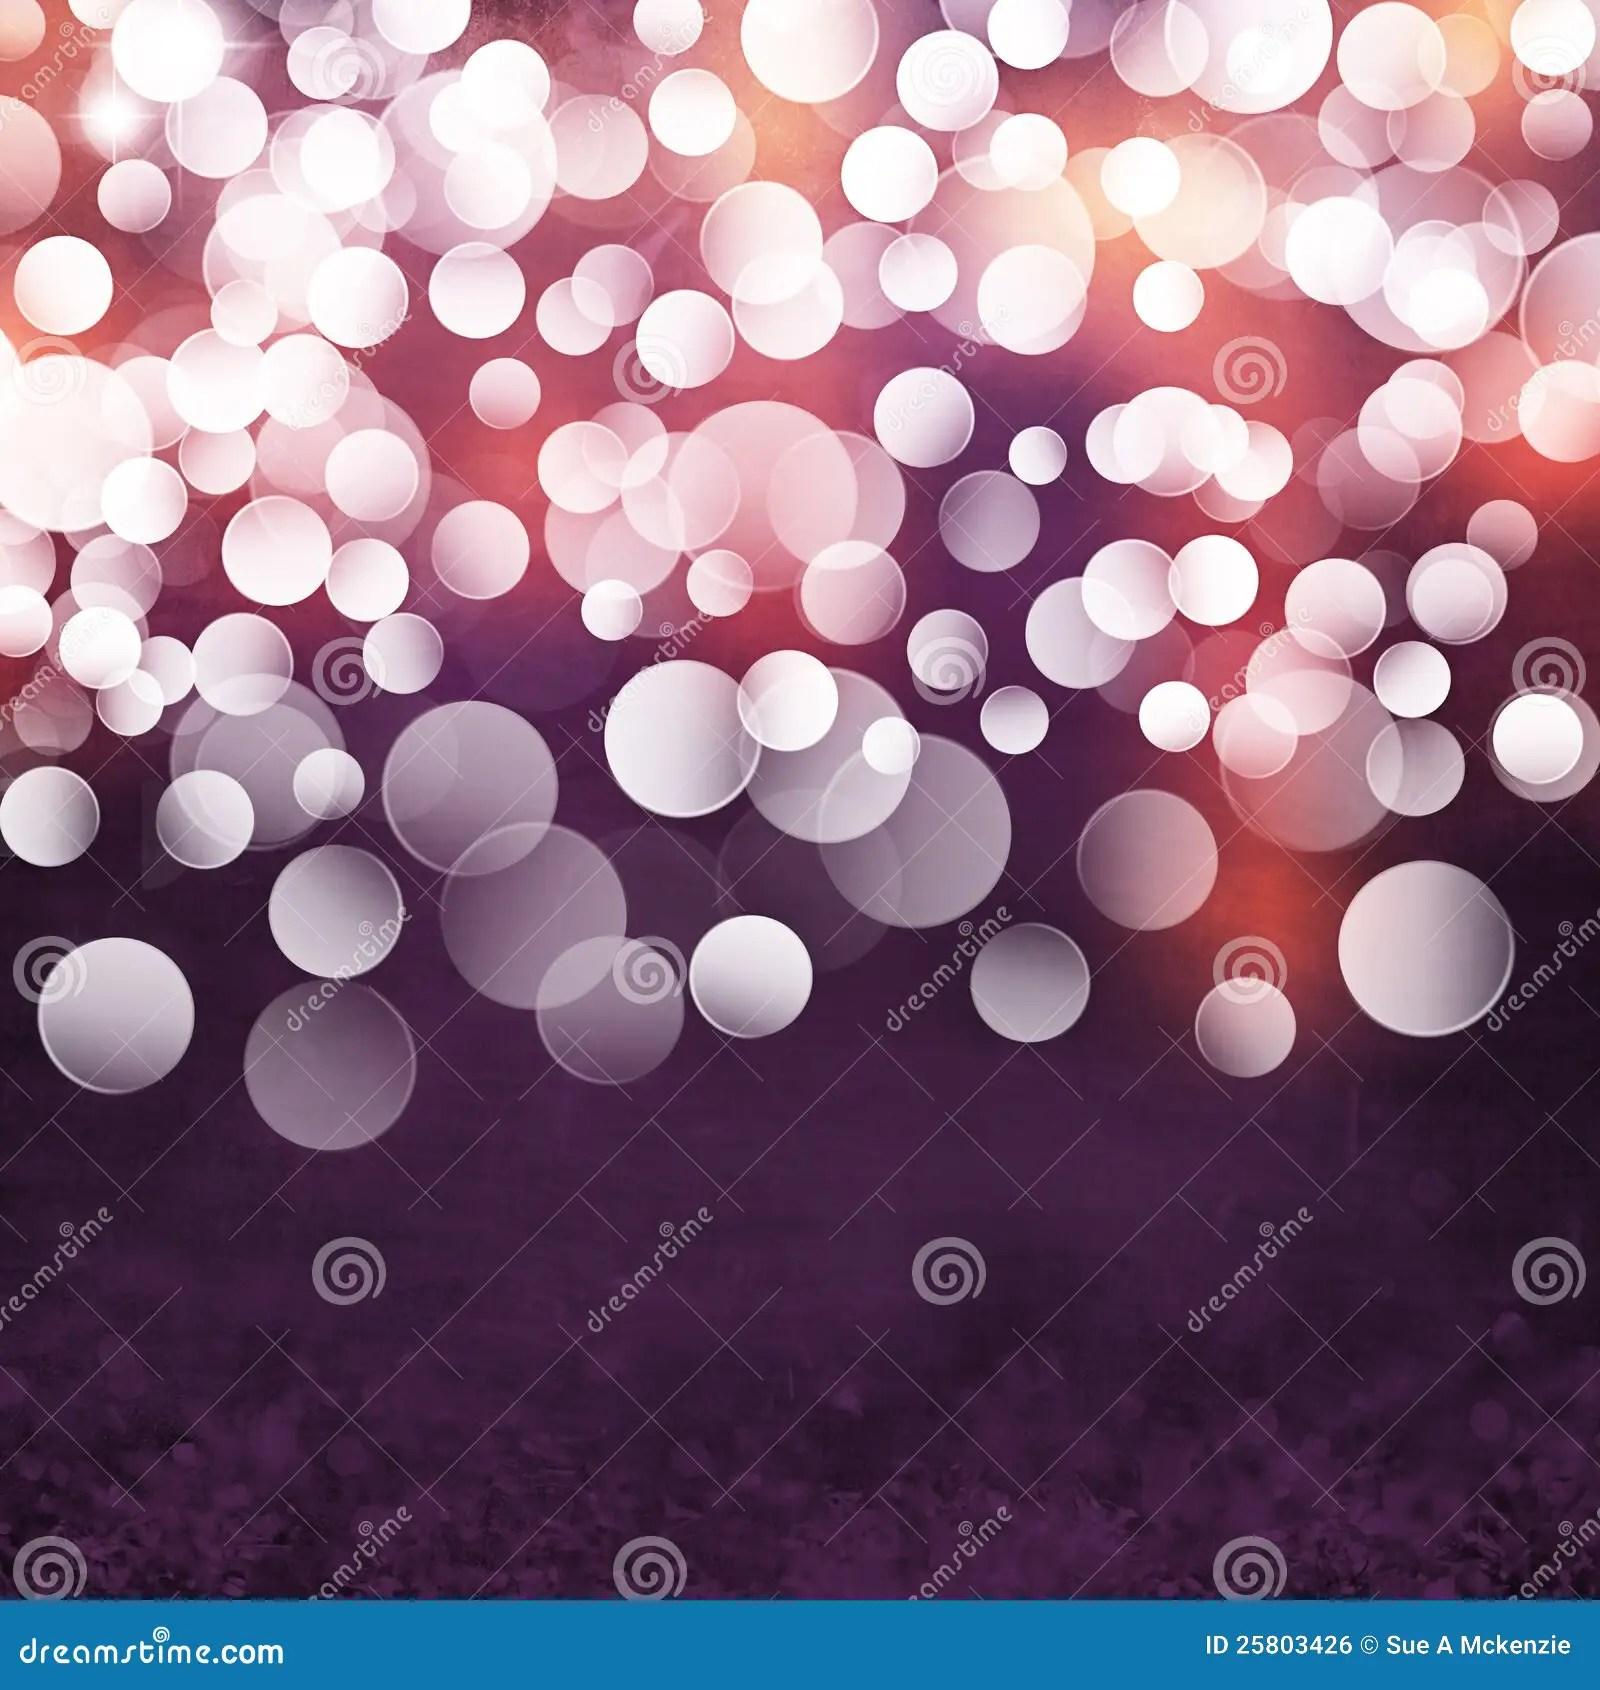 Elegant Textured Grunge Purple Gold Pink Christmas Light